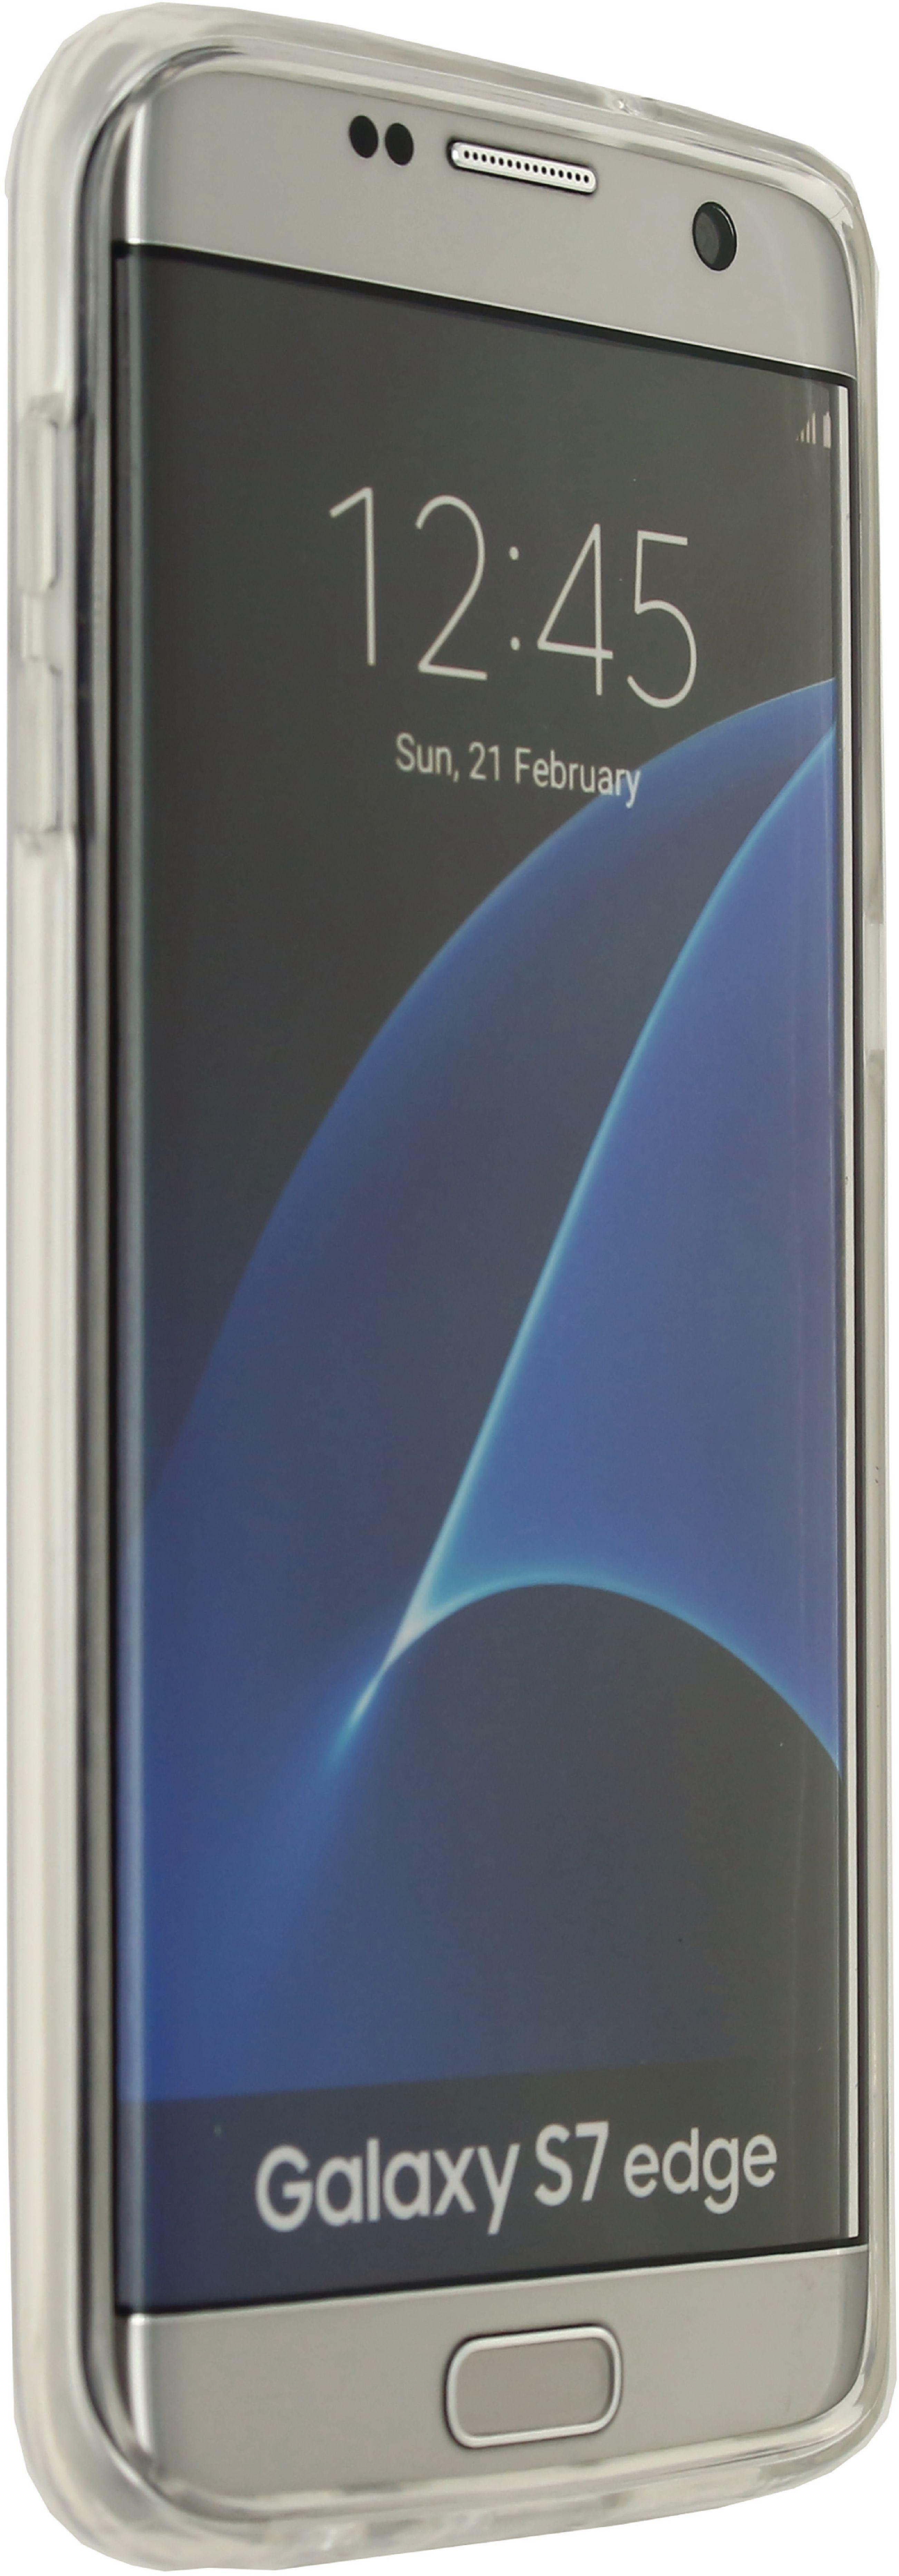 Image of   Telefon Transparent Beskyttelsesetui Samsung Galaxy S7 Edge Gennemsigtig